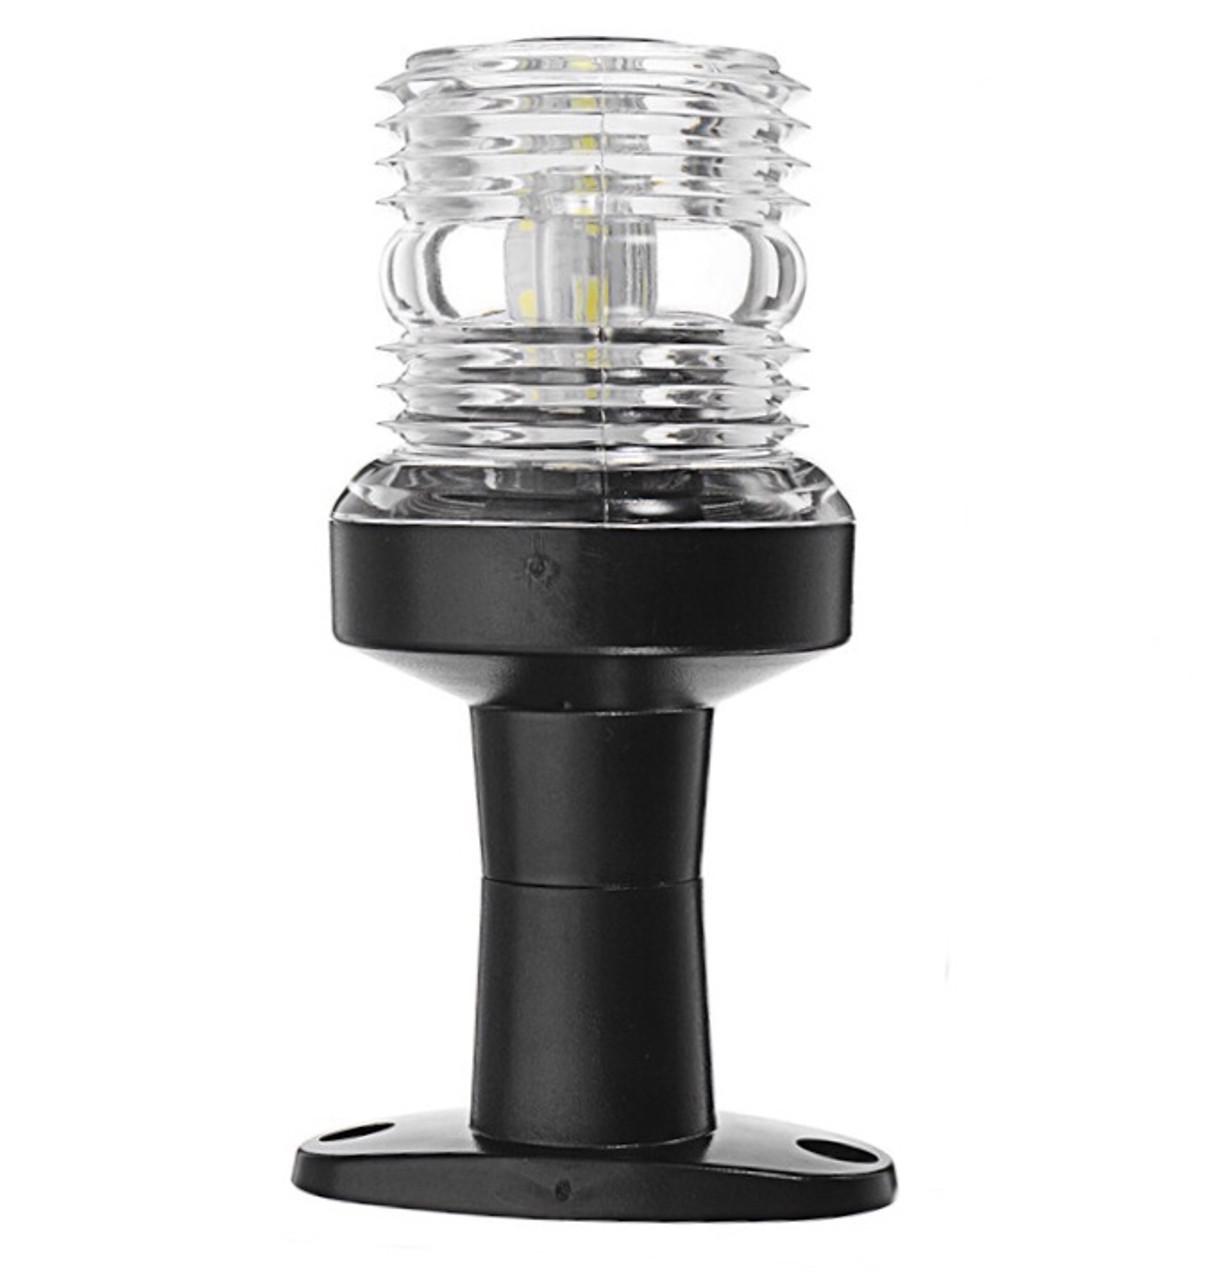 LED Anchor Light Marinebeam